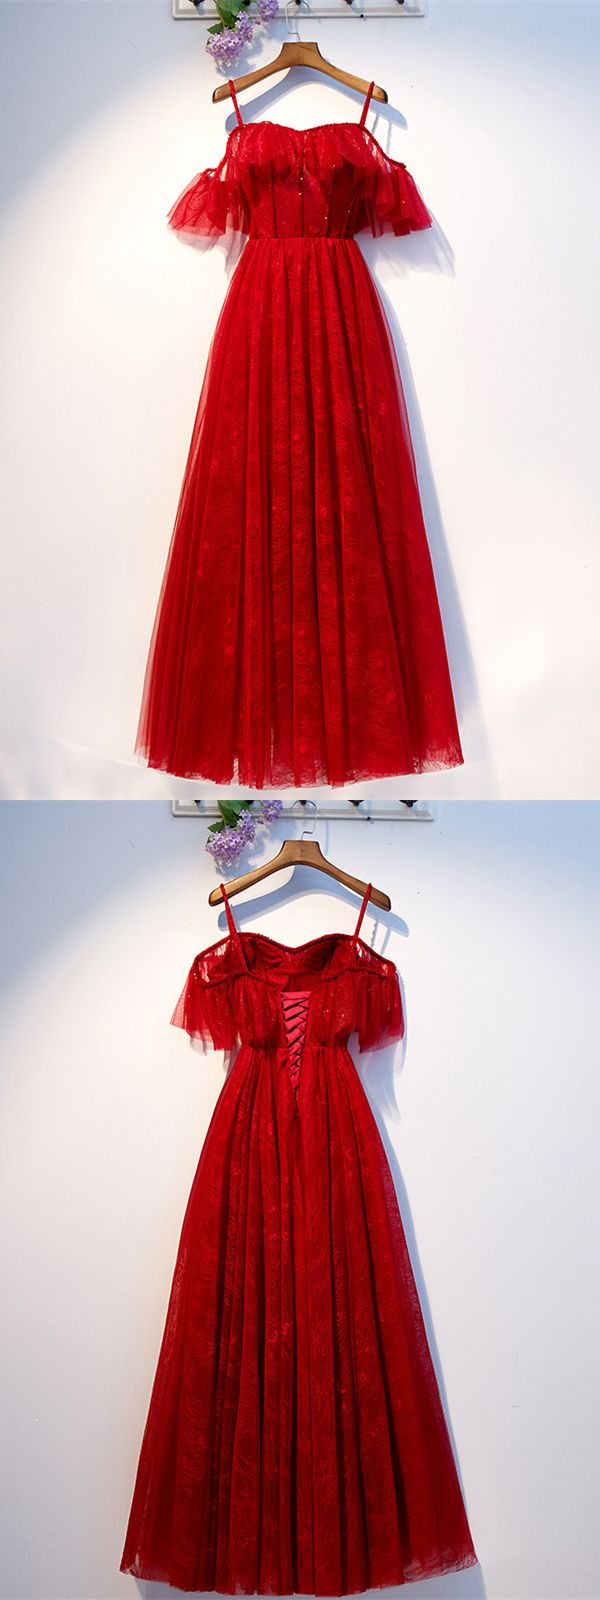 elegante a linie abendkleid brautkleid lang rot tüll spitze